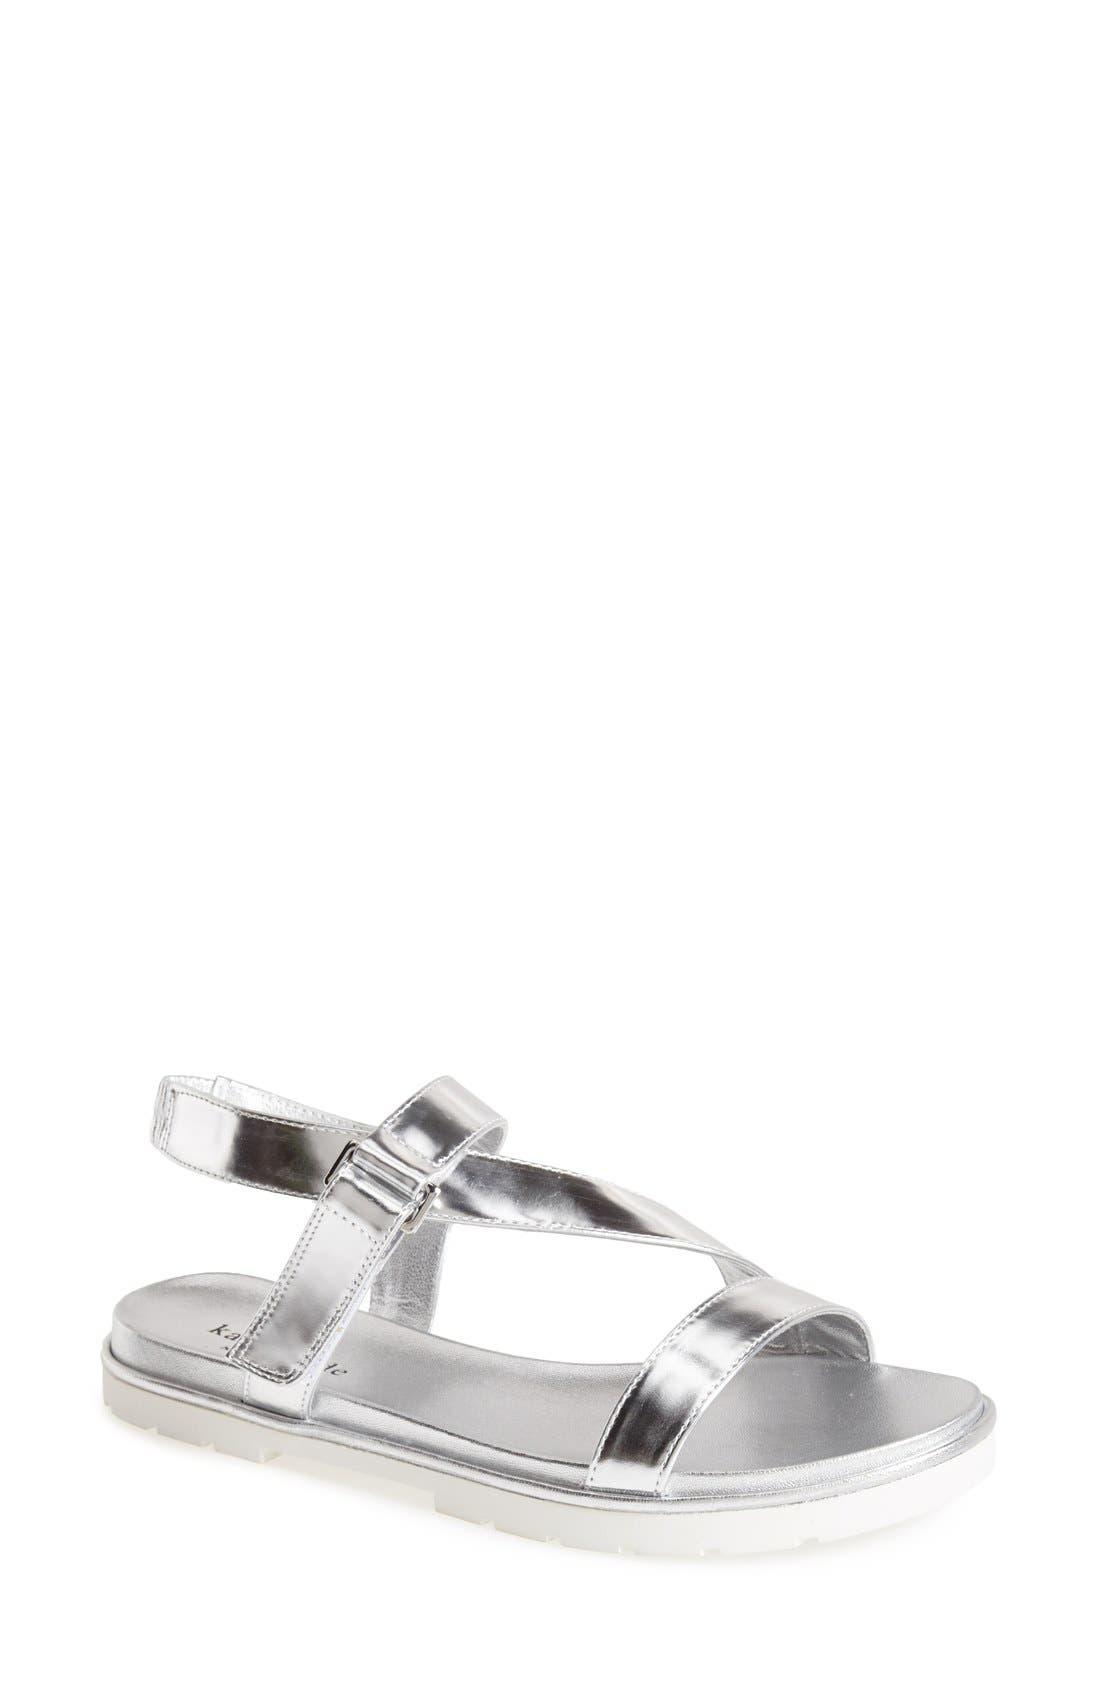 Alternate Image 1 Selected - kate spade new york 'mckee' leather sandal (Women)